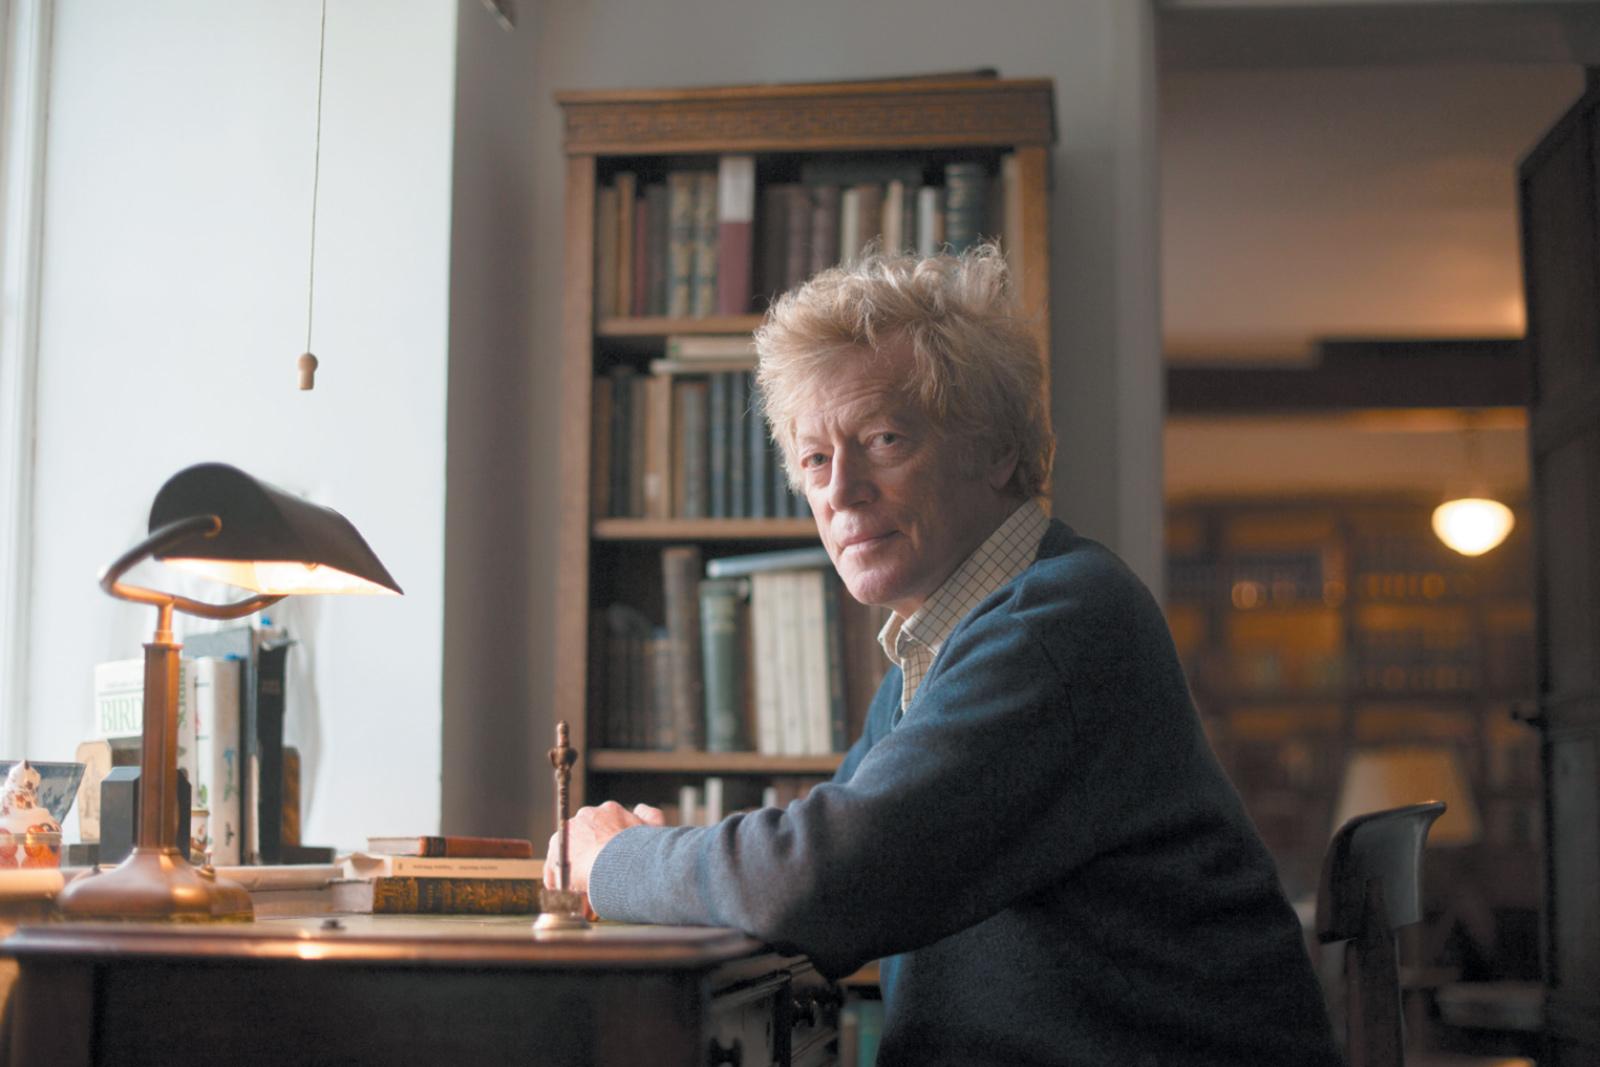 Roger Scruton, Wiltshire, England, November 2011